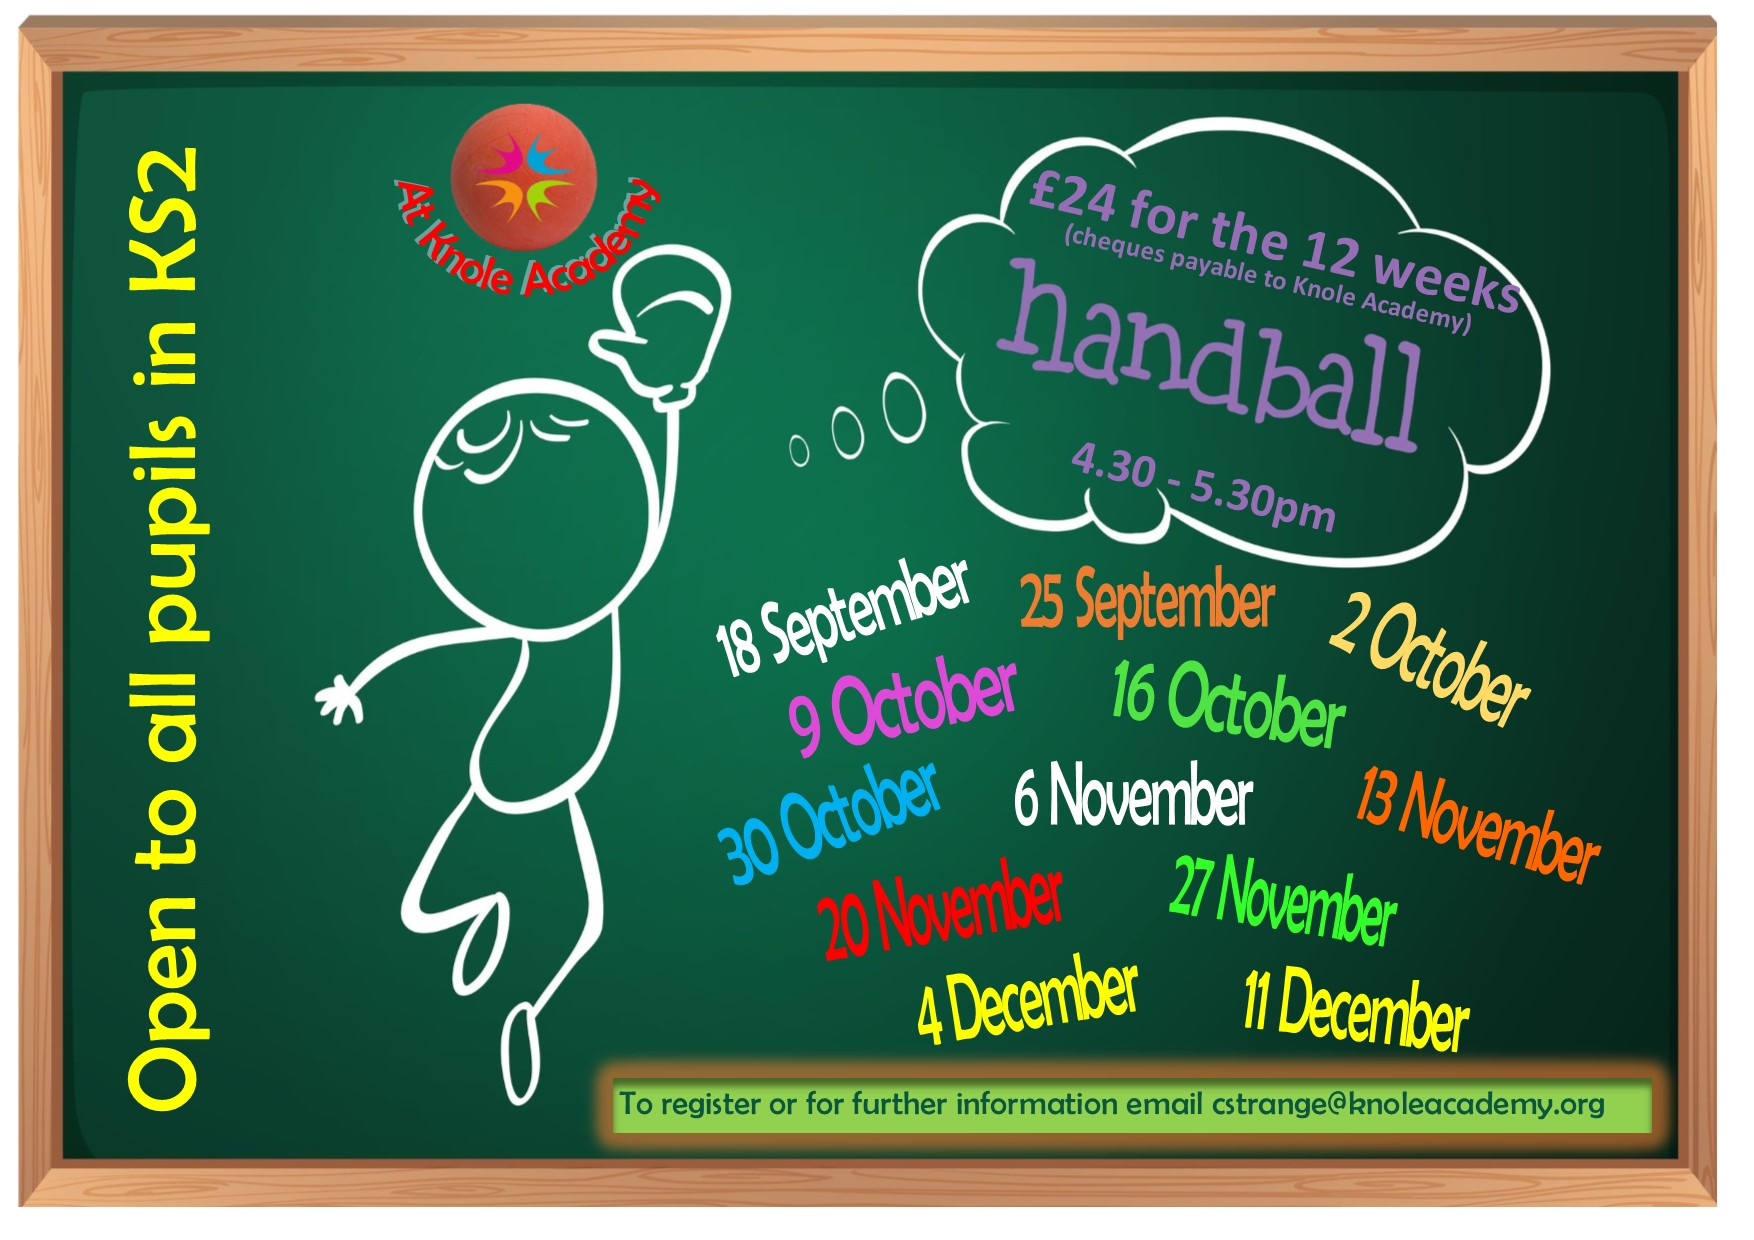 Poster for handball Term 1 & 2 2018-2019